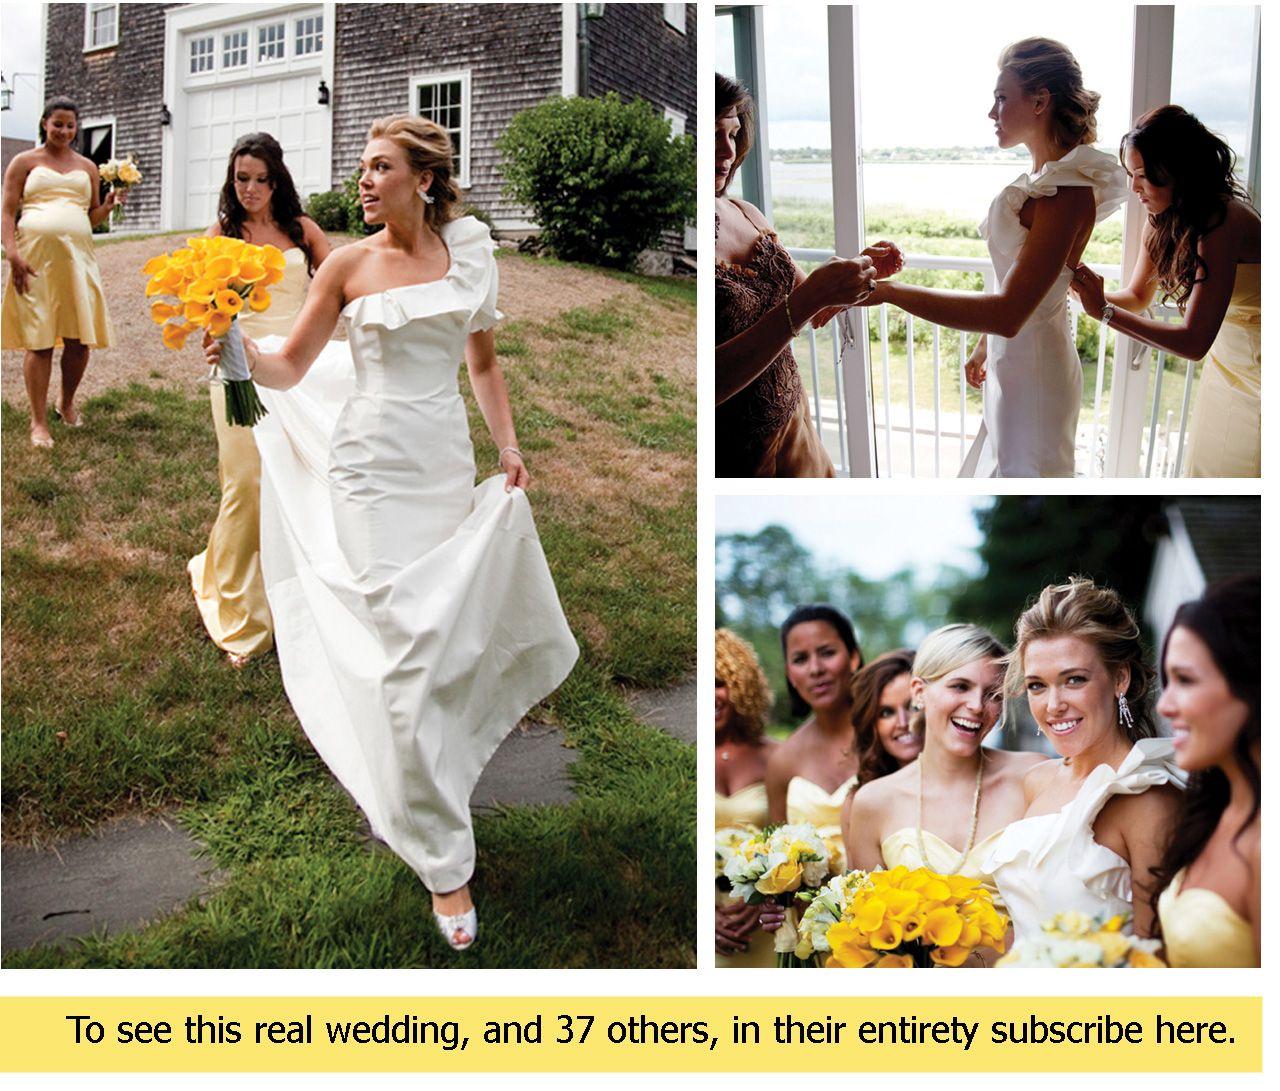 Rachel Platten - Southern-New-England-Weddings-and